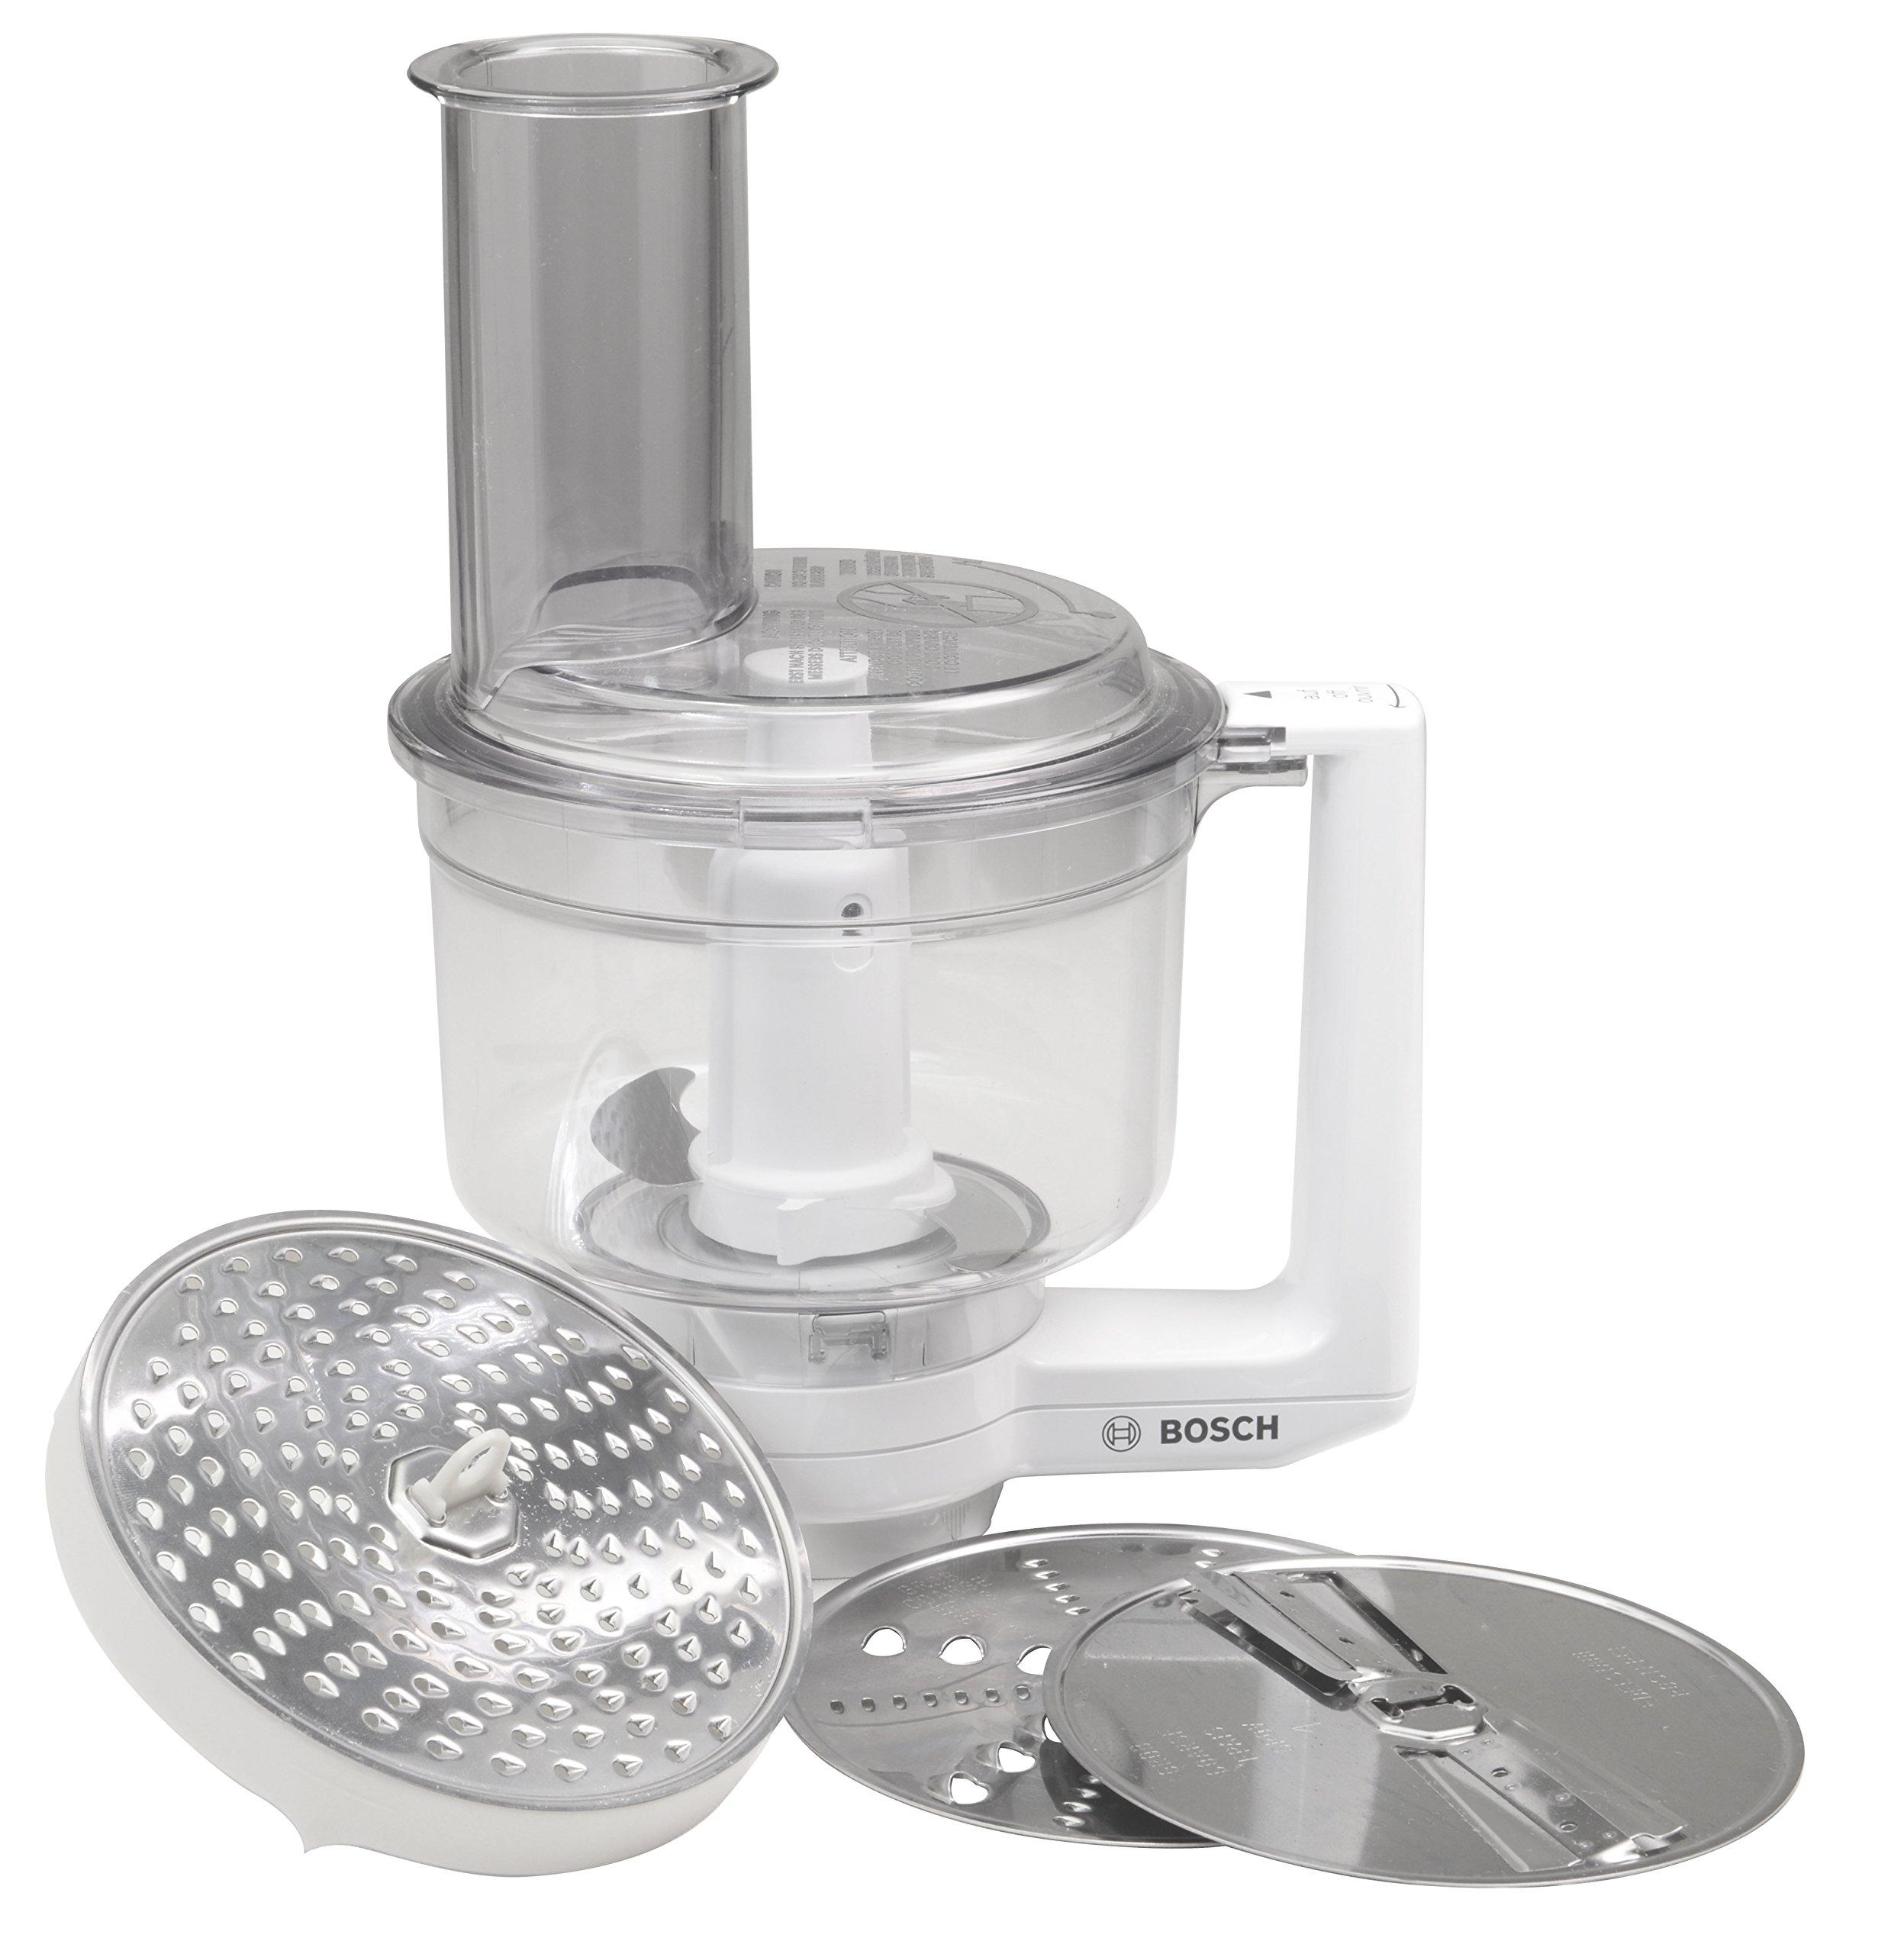 Bosch Food Processor For Compact Mixer